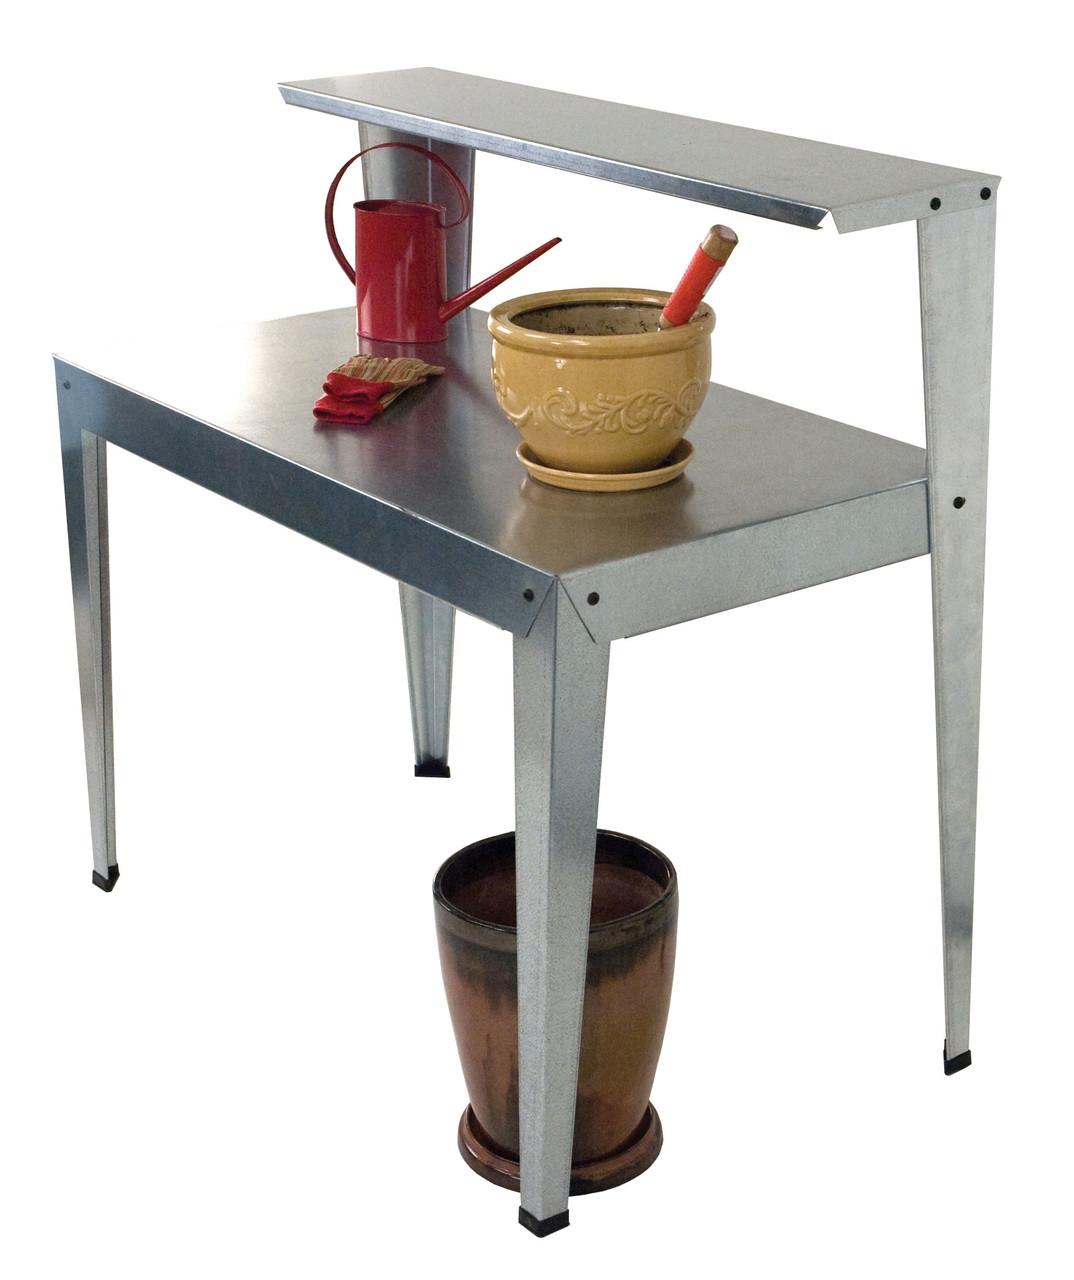 Galvanized Potting Bench